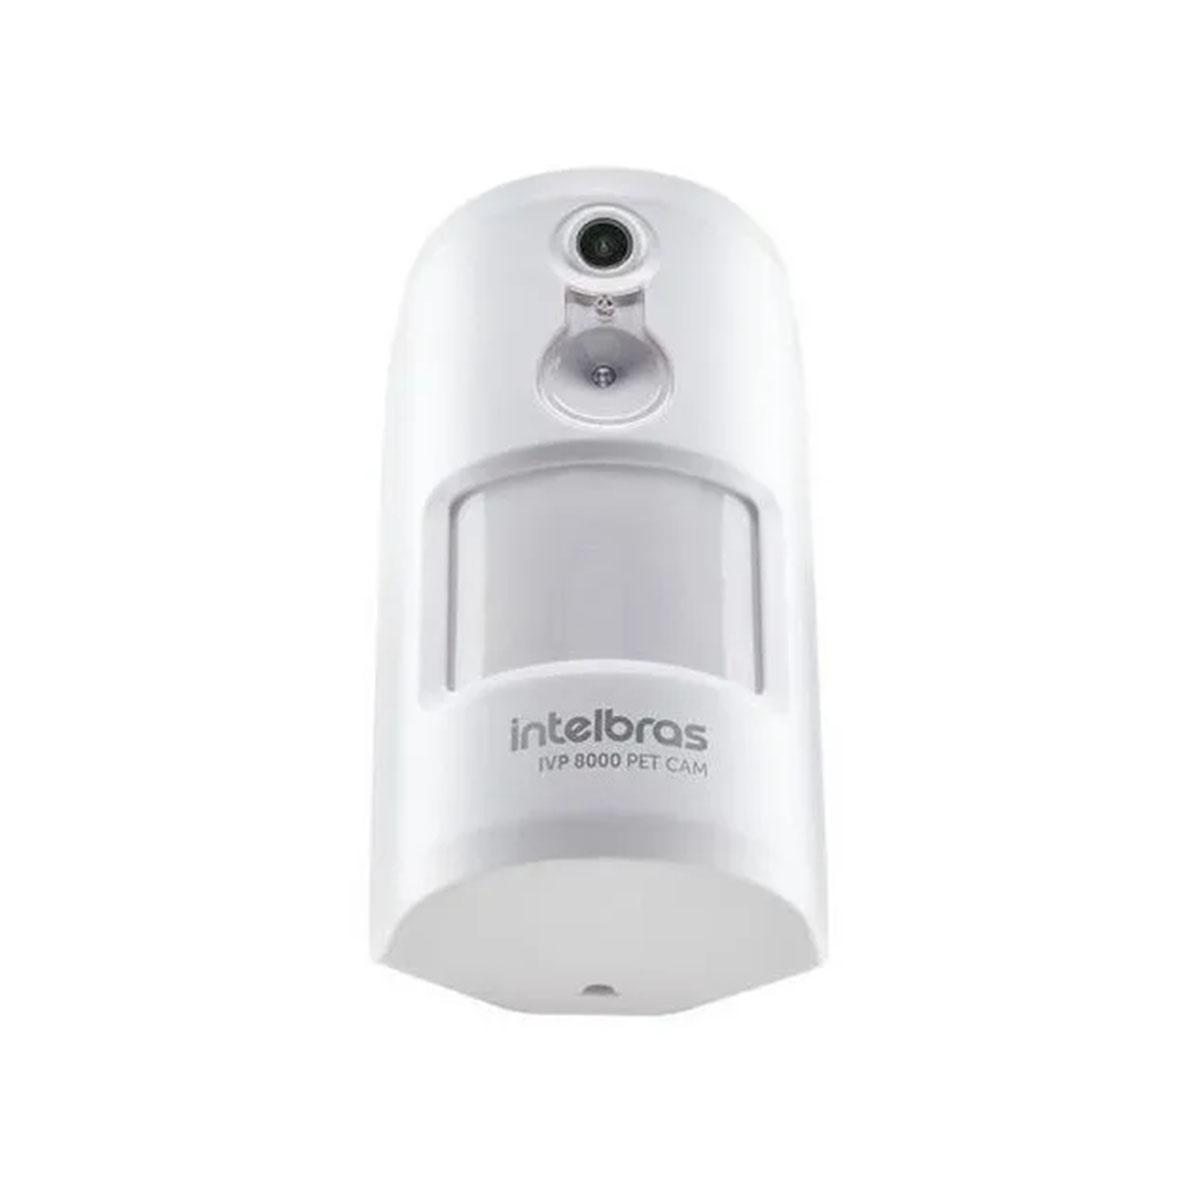 Kit 04 Sensor Passivo Sem Fio Intelbras Ivp 8000 Pet Cam